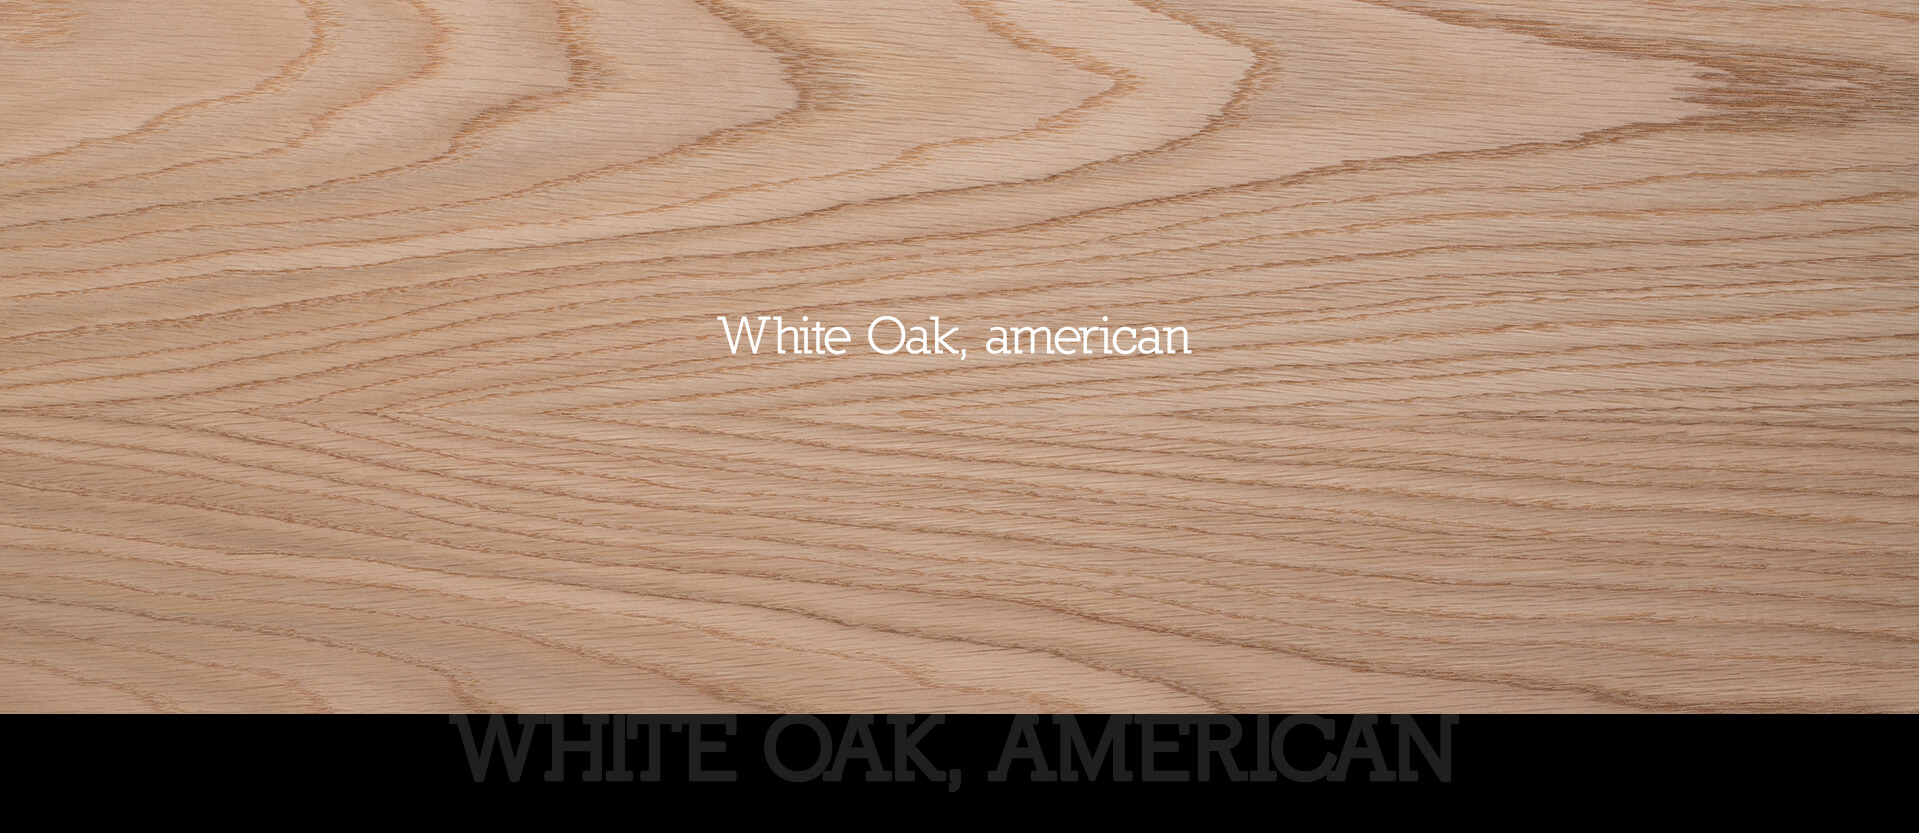 32 WhiteOak american